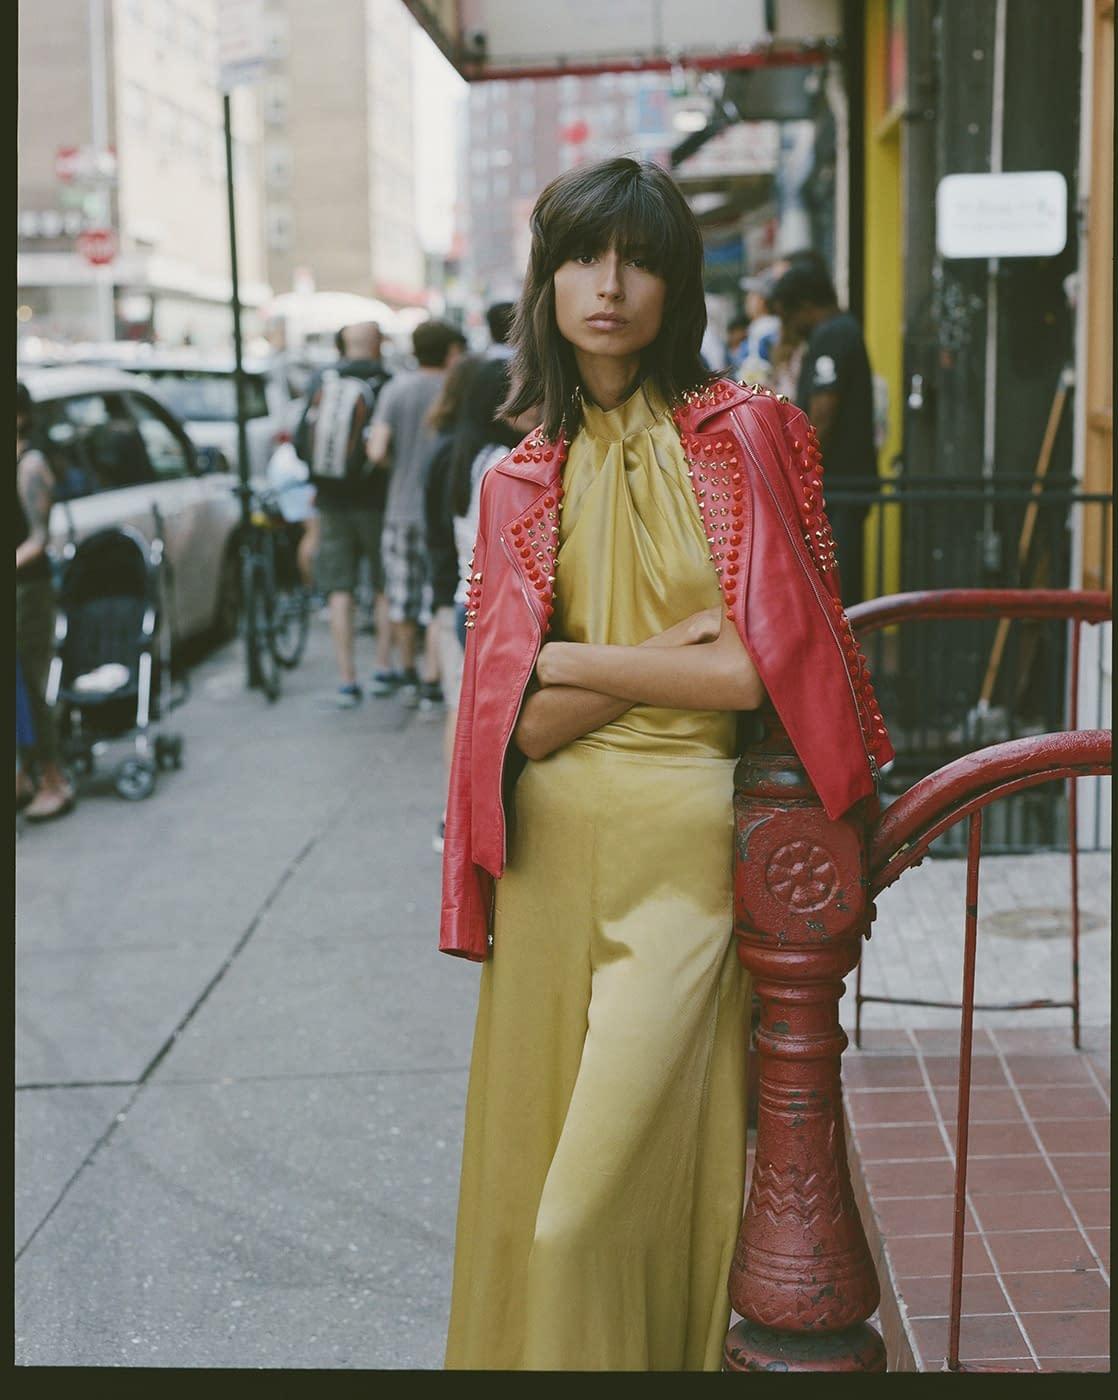 New York Stories 1 photo Enric Galceran - 19